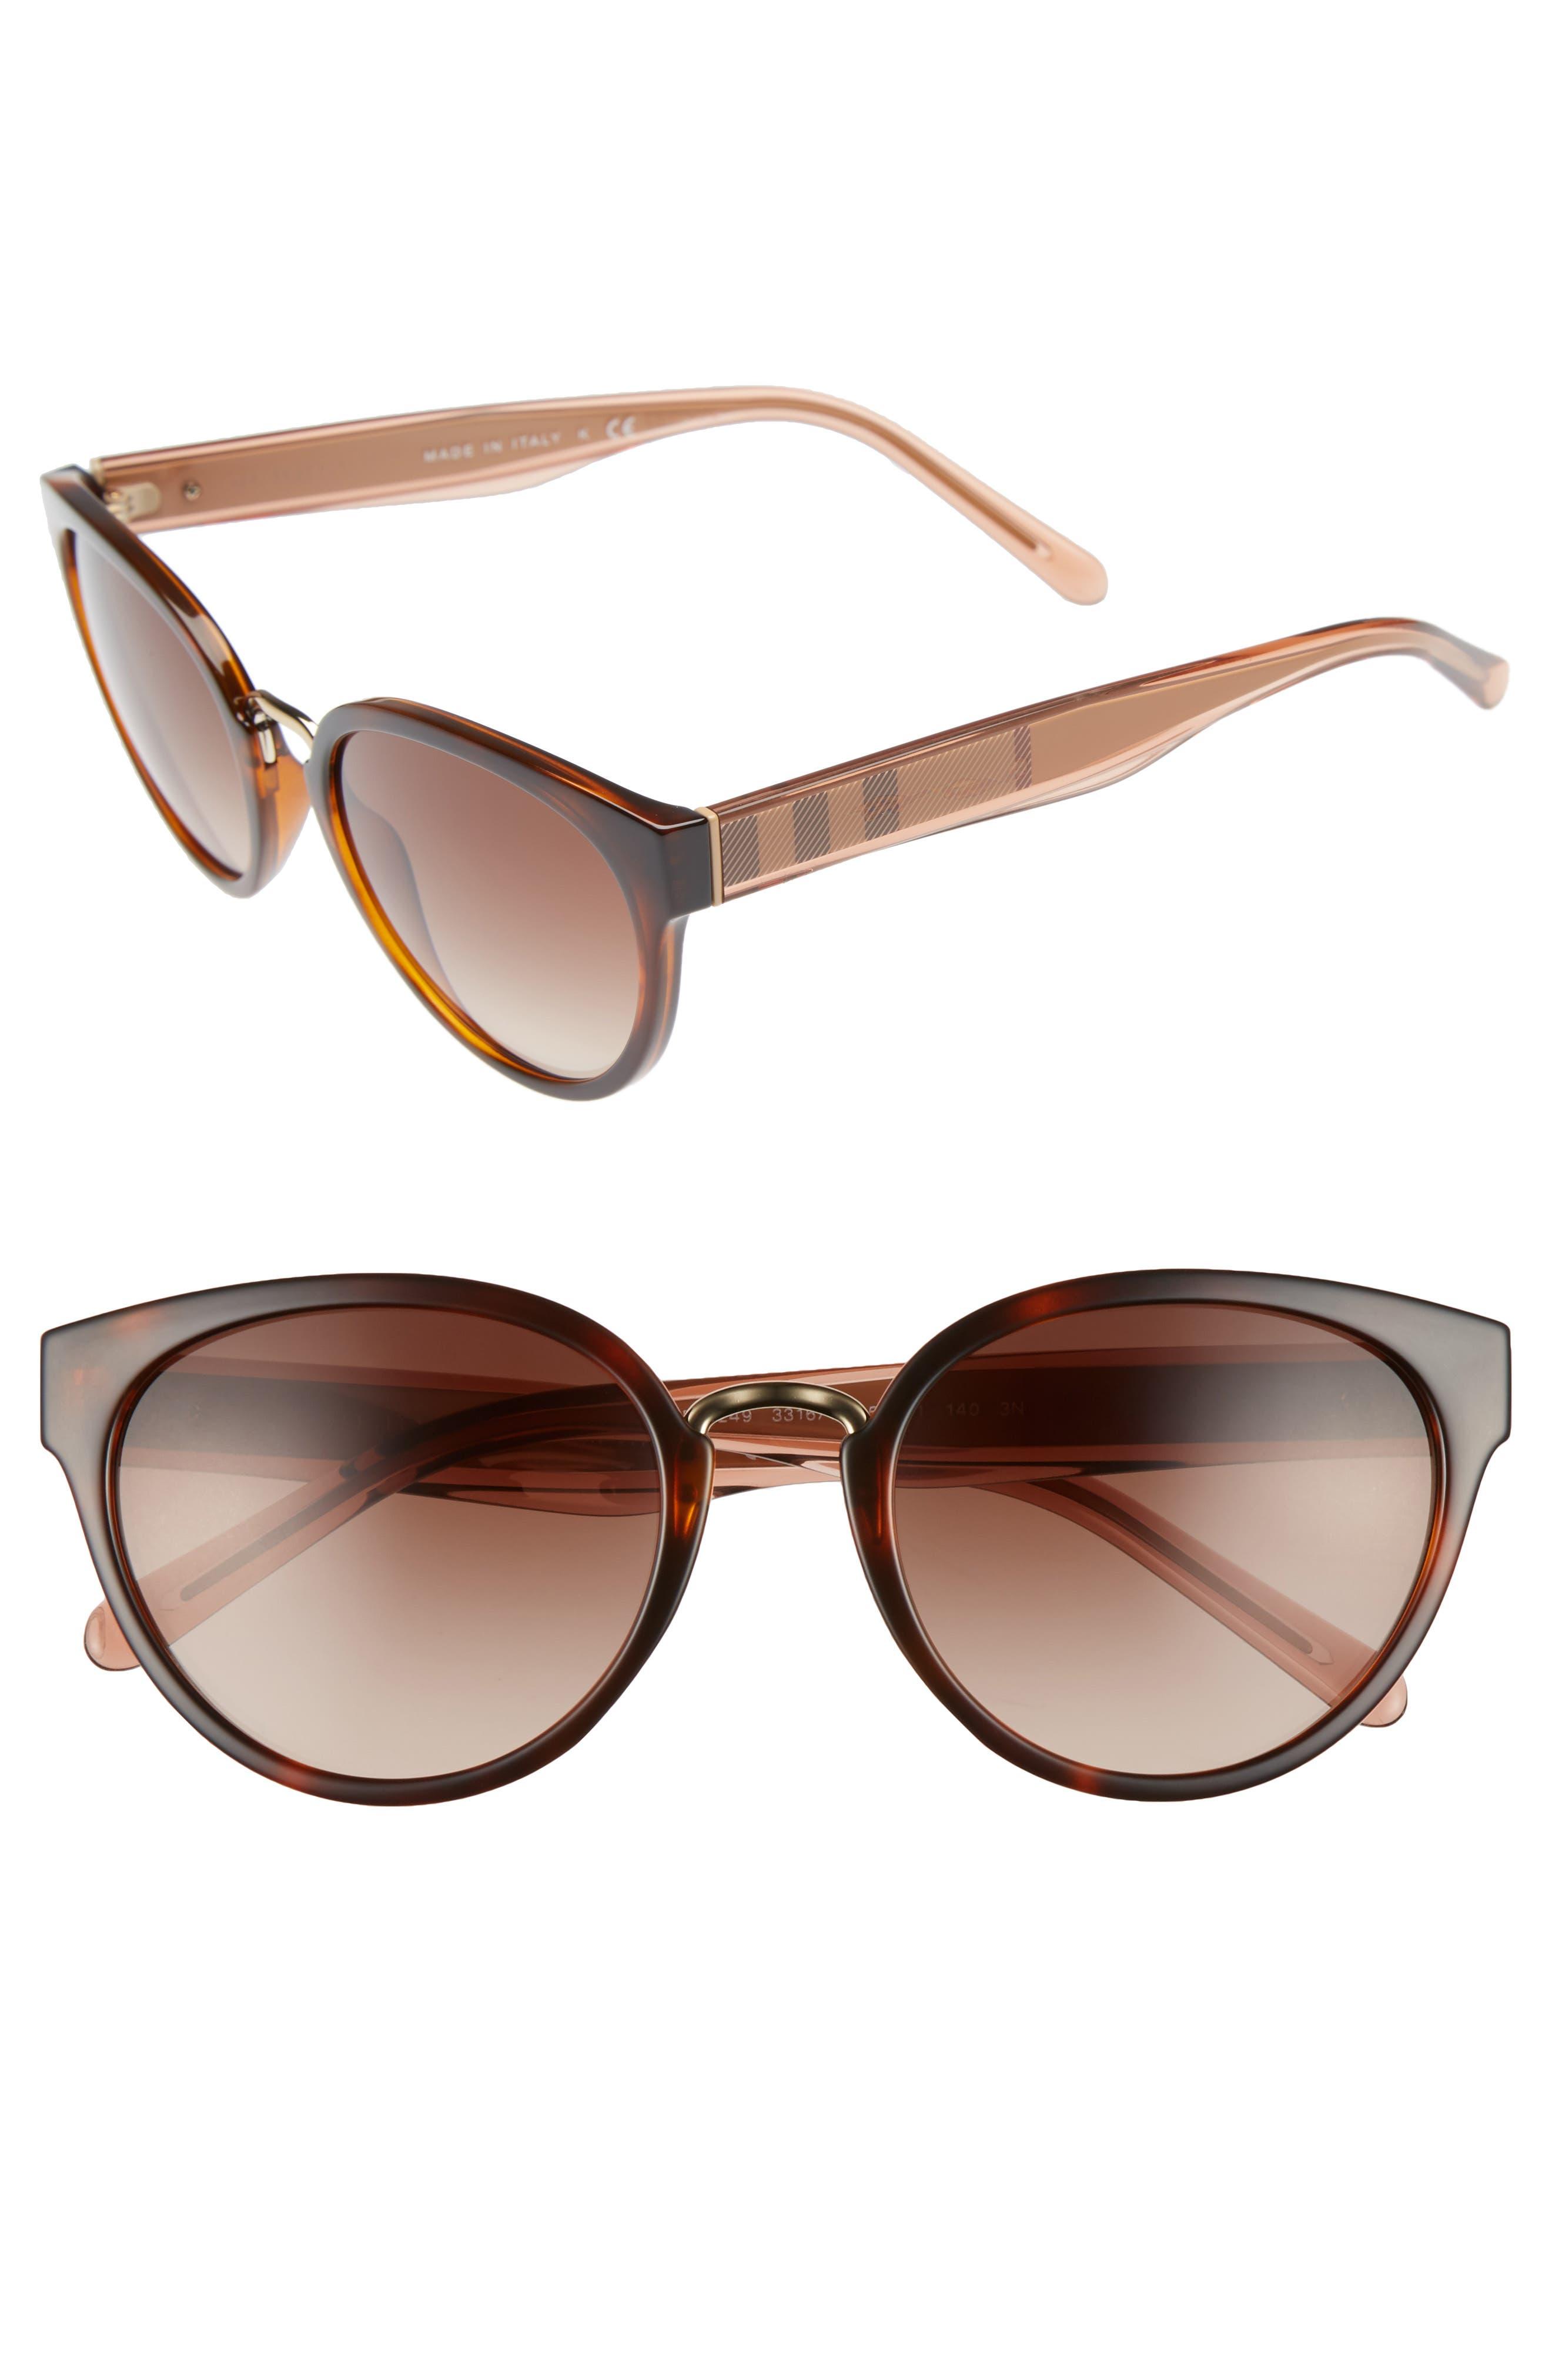 Burberry 53mm Gradient Cat Eye Sunglasses